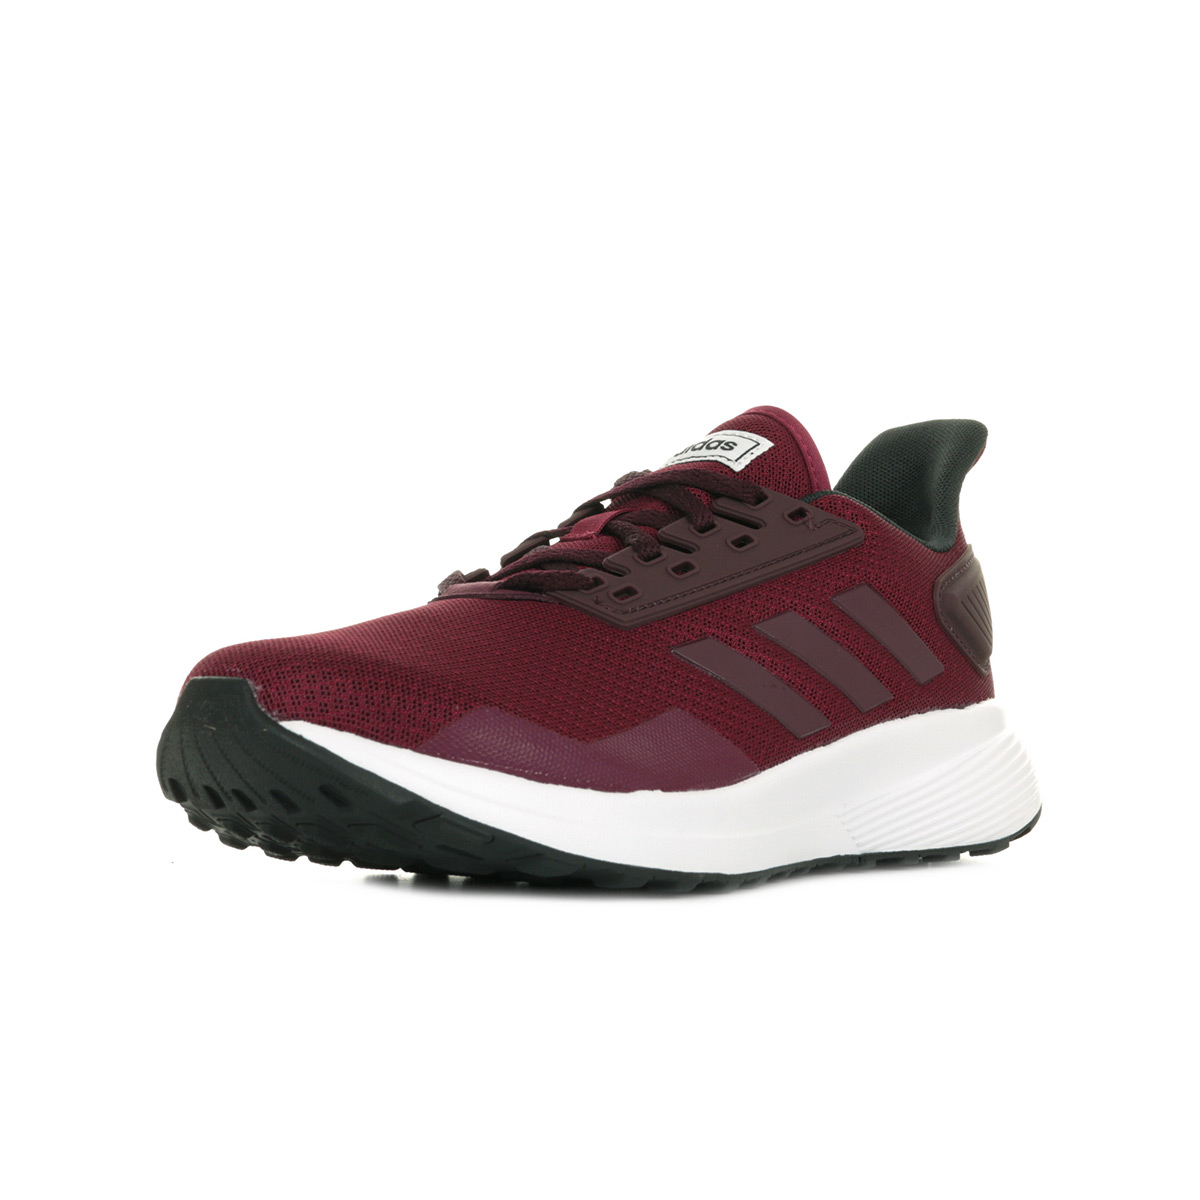 Chaussures running Duramo 9 Femme Adidas